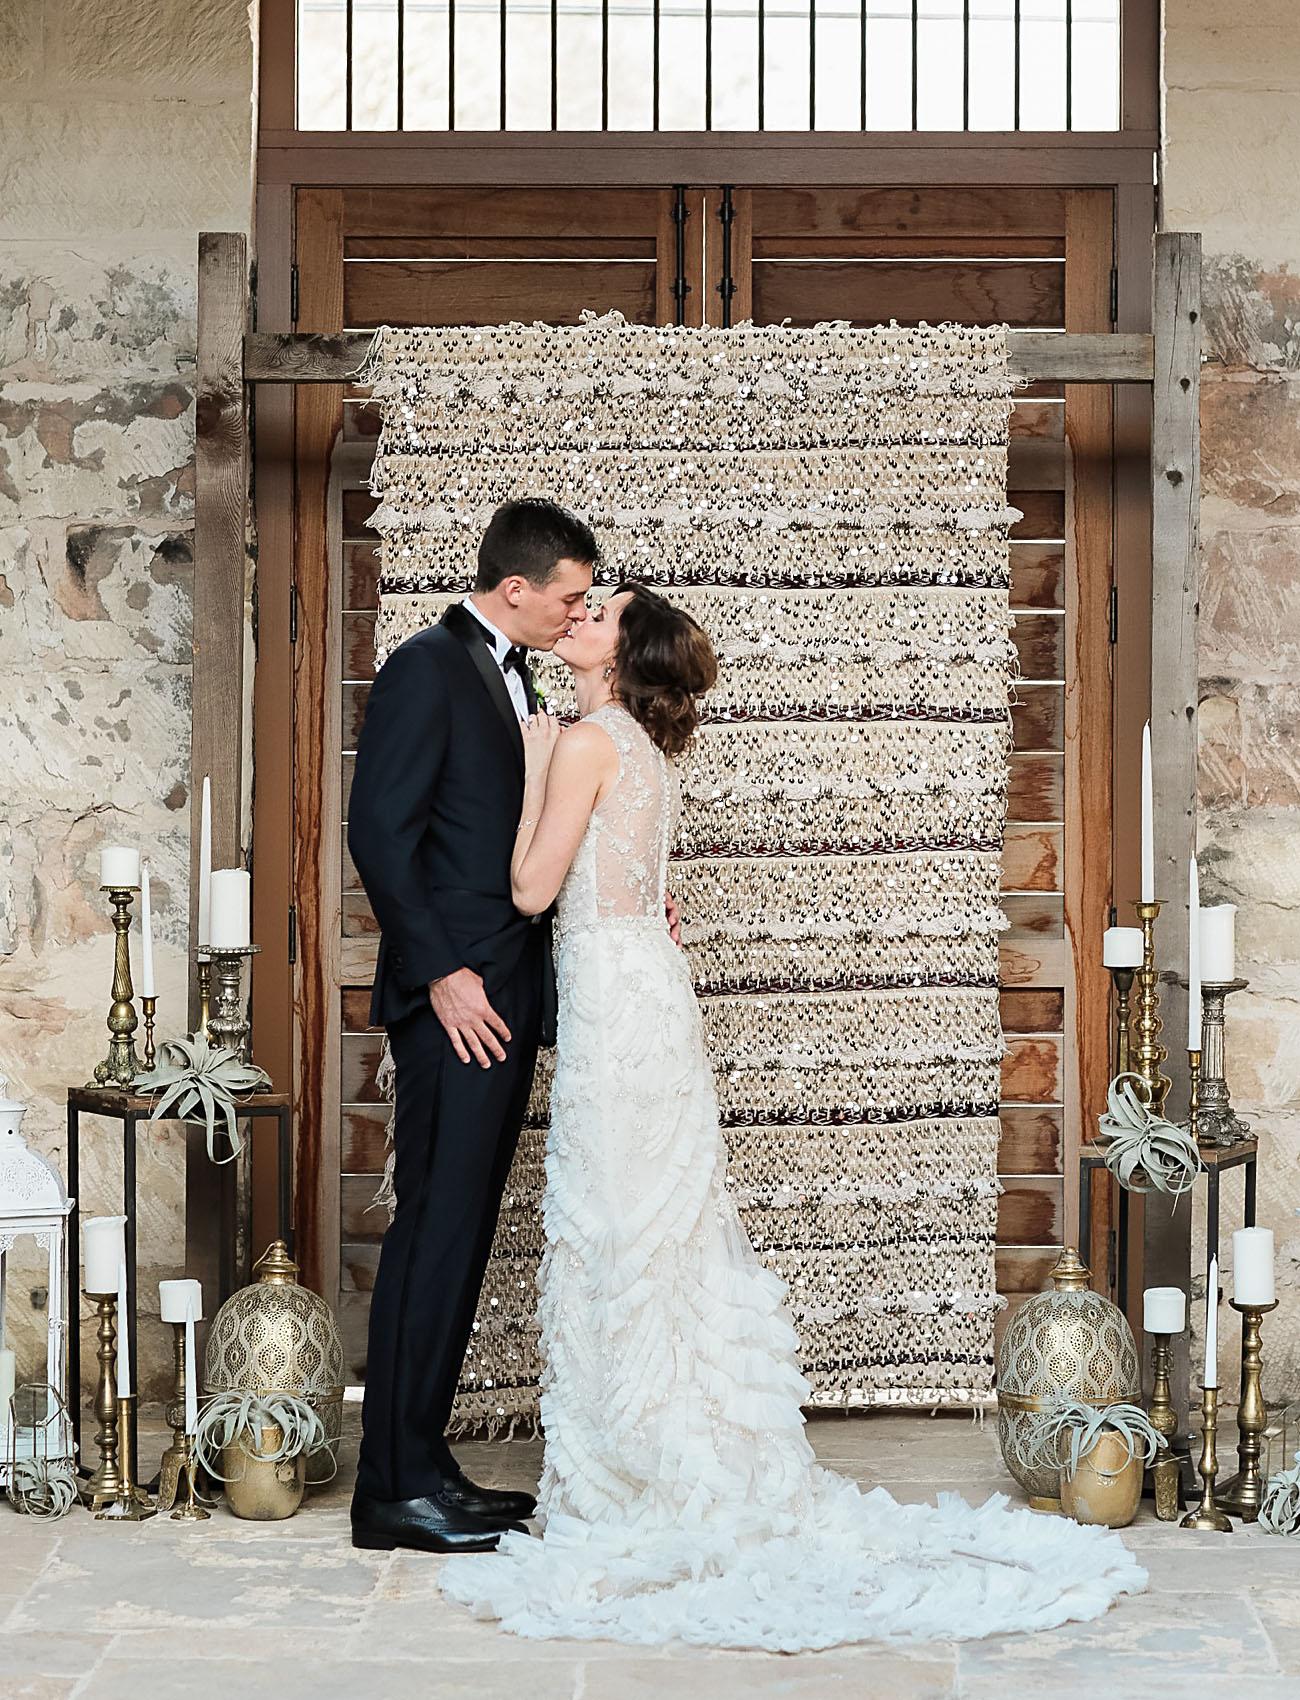 Moroccan Wedding Blanket Backdrop